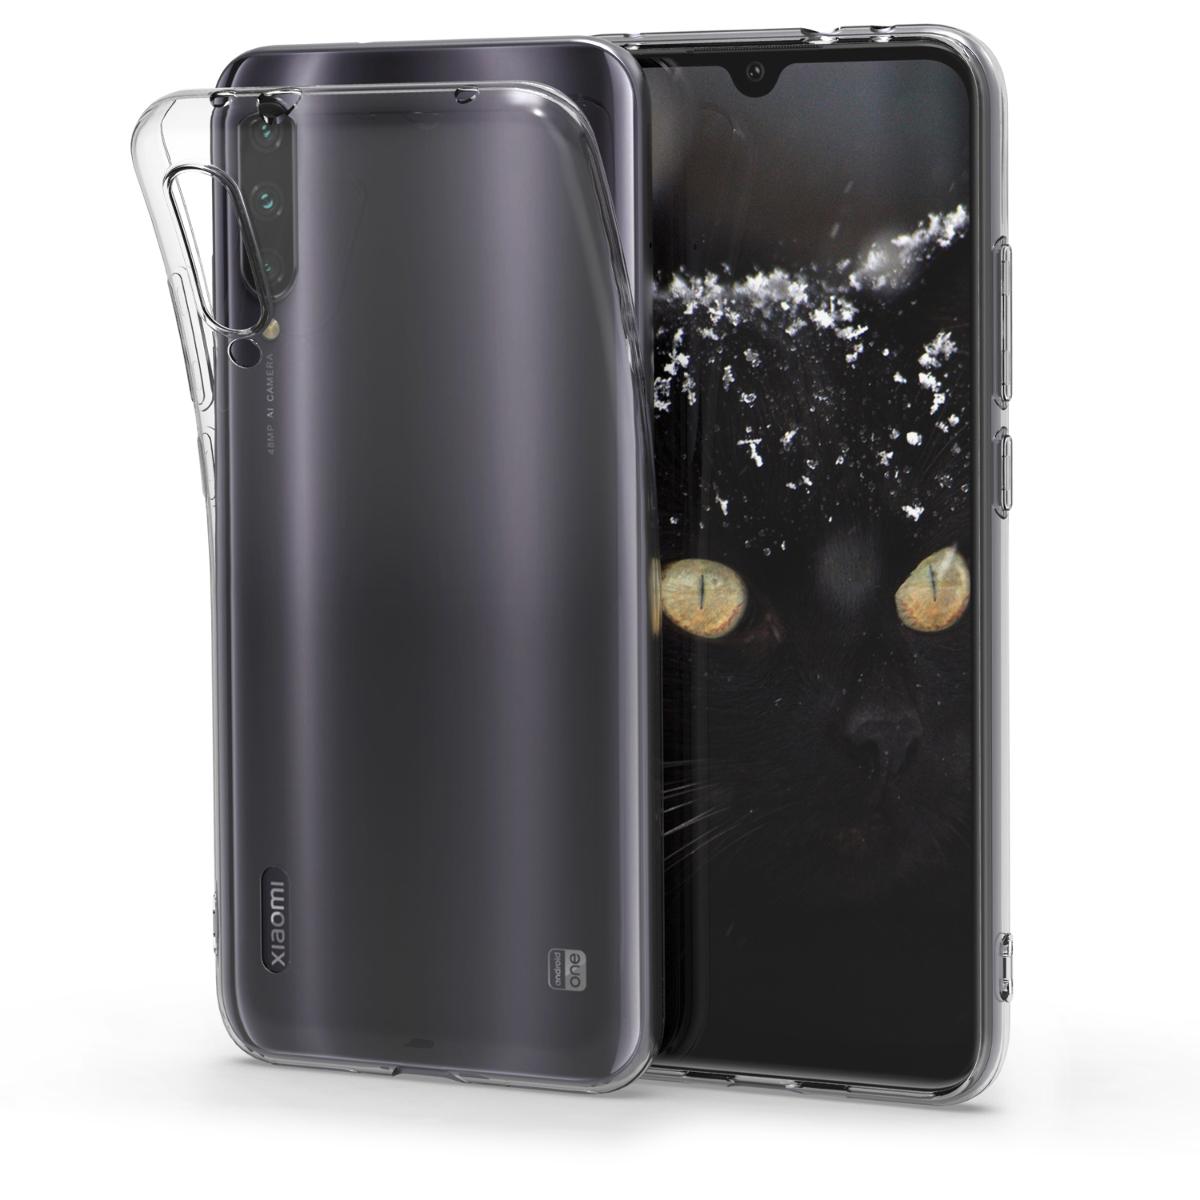 KW Θήκη Σιλικόνης Xiaomi Mi A3  - Transparent (49677.03)